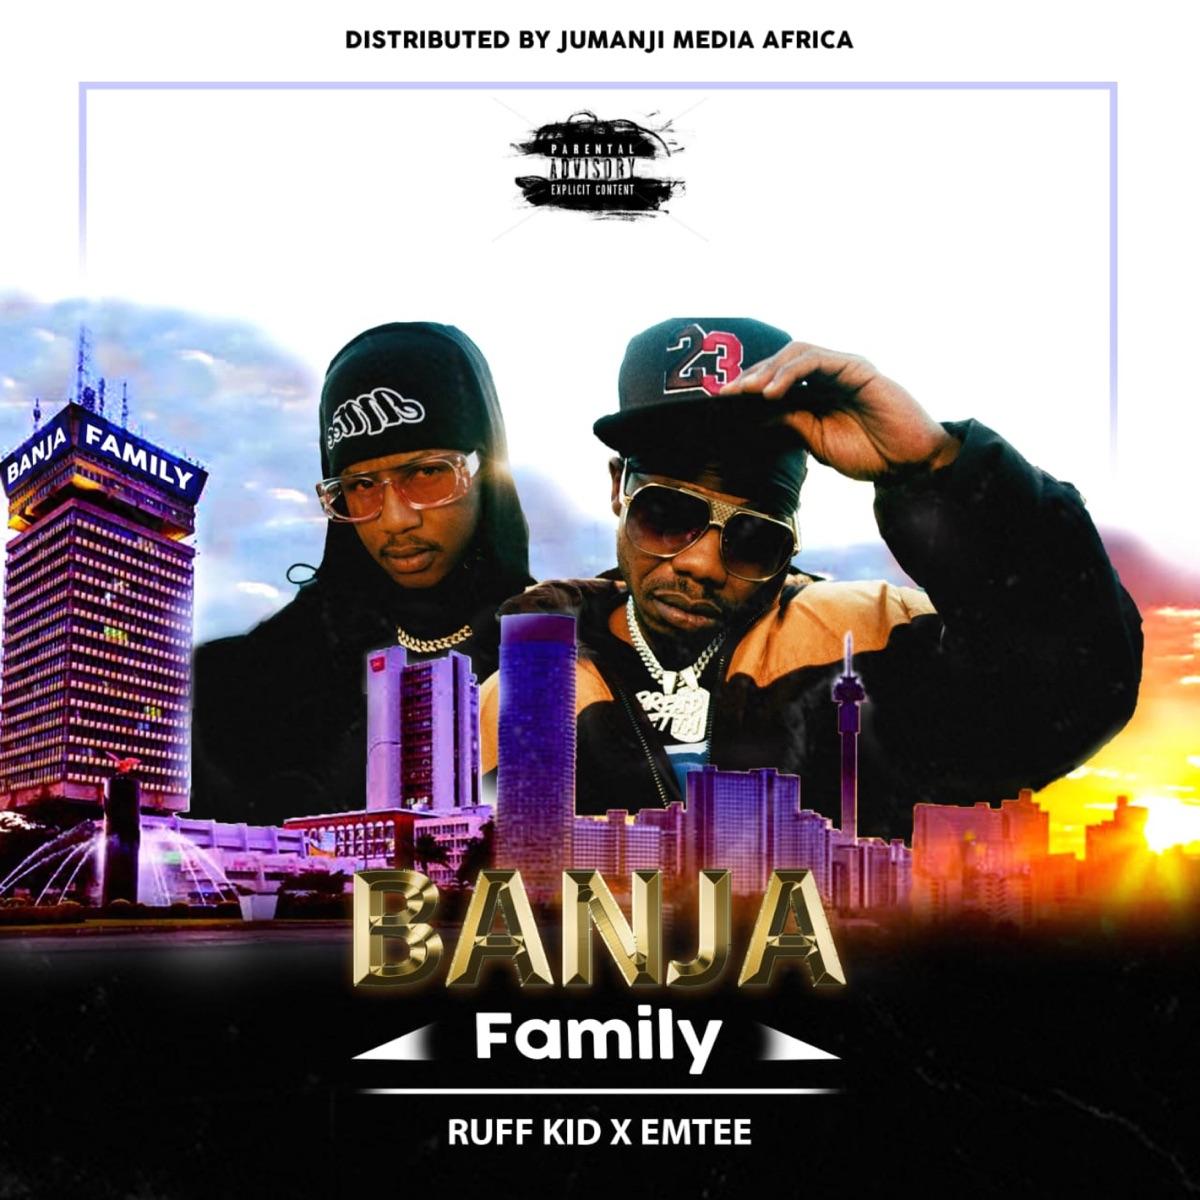 Ruff Kid ft. Emtee - Banja (Family)